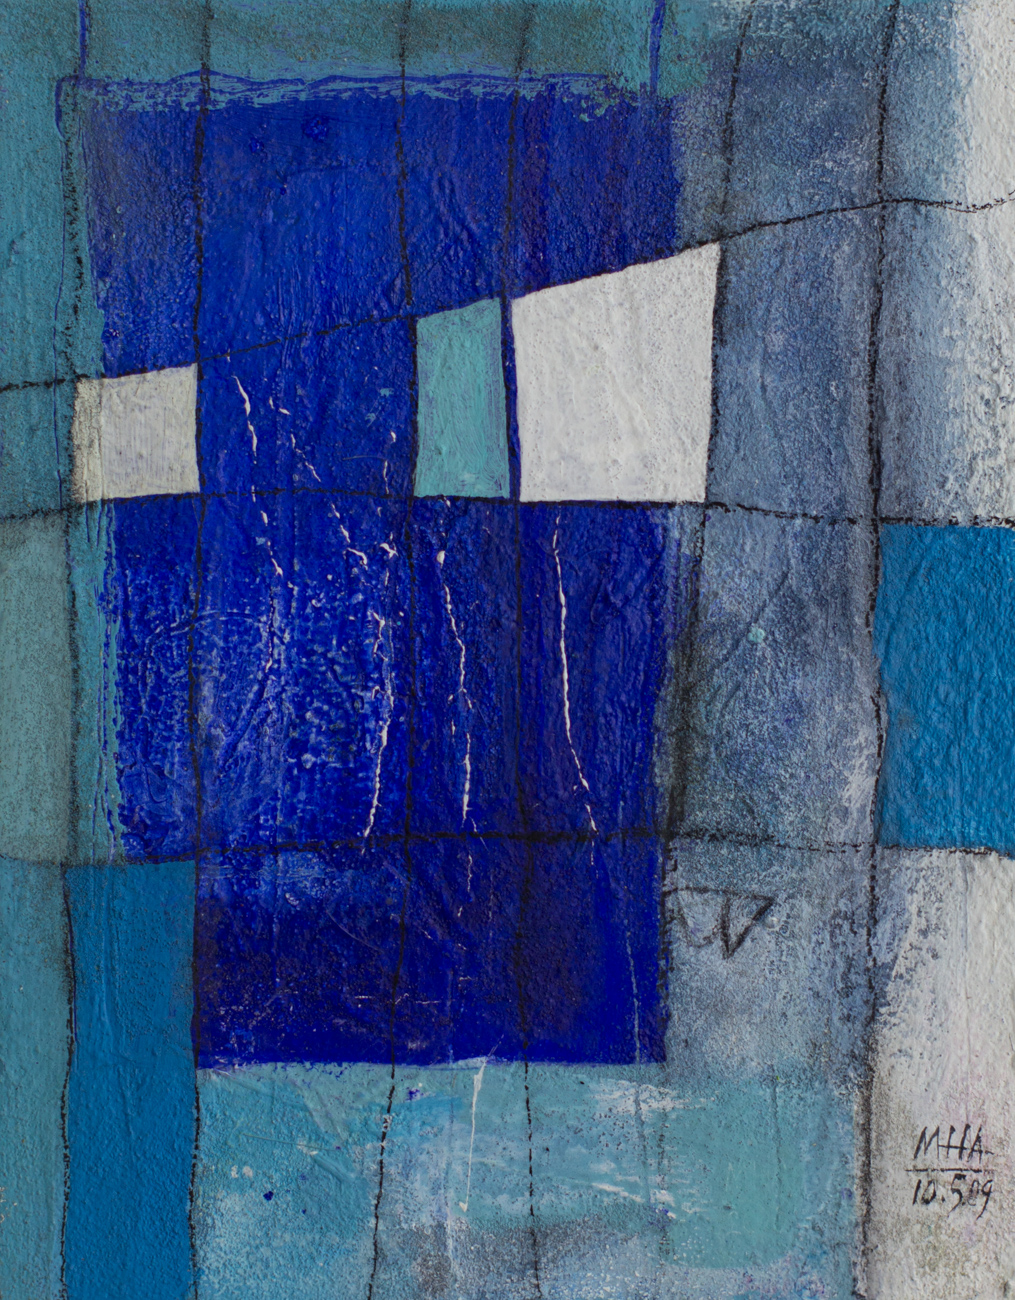 Fantasie in Linien 16 , 2009,Acryl auf Leinwand, 24x30 cm